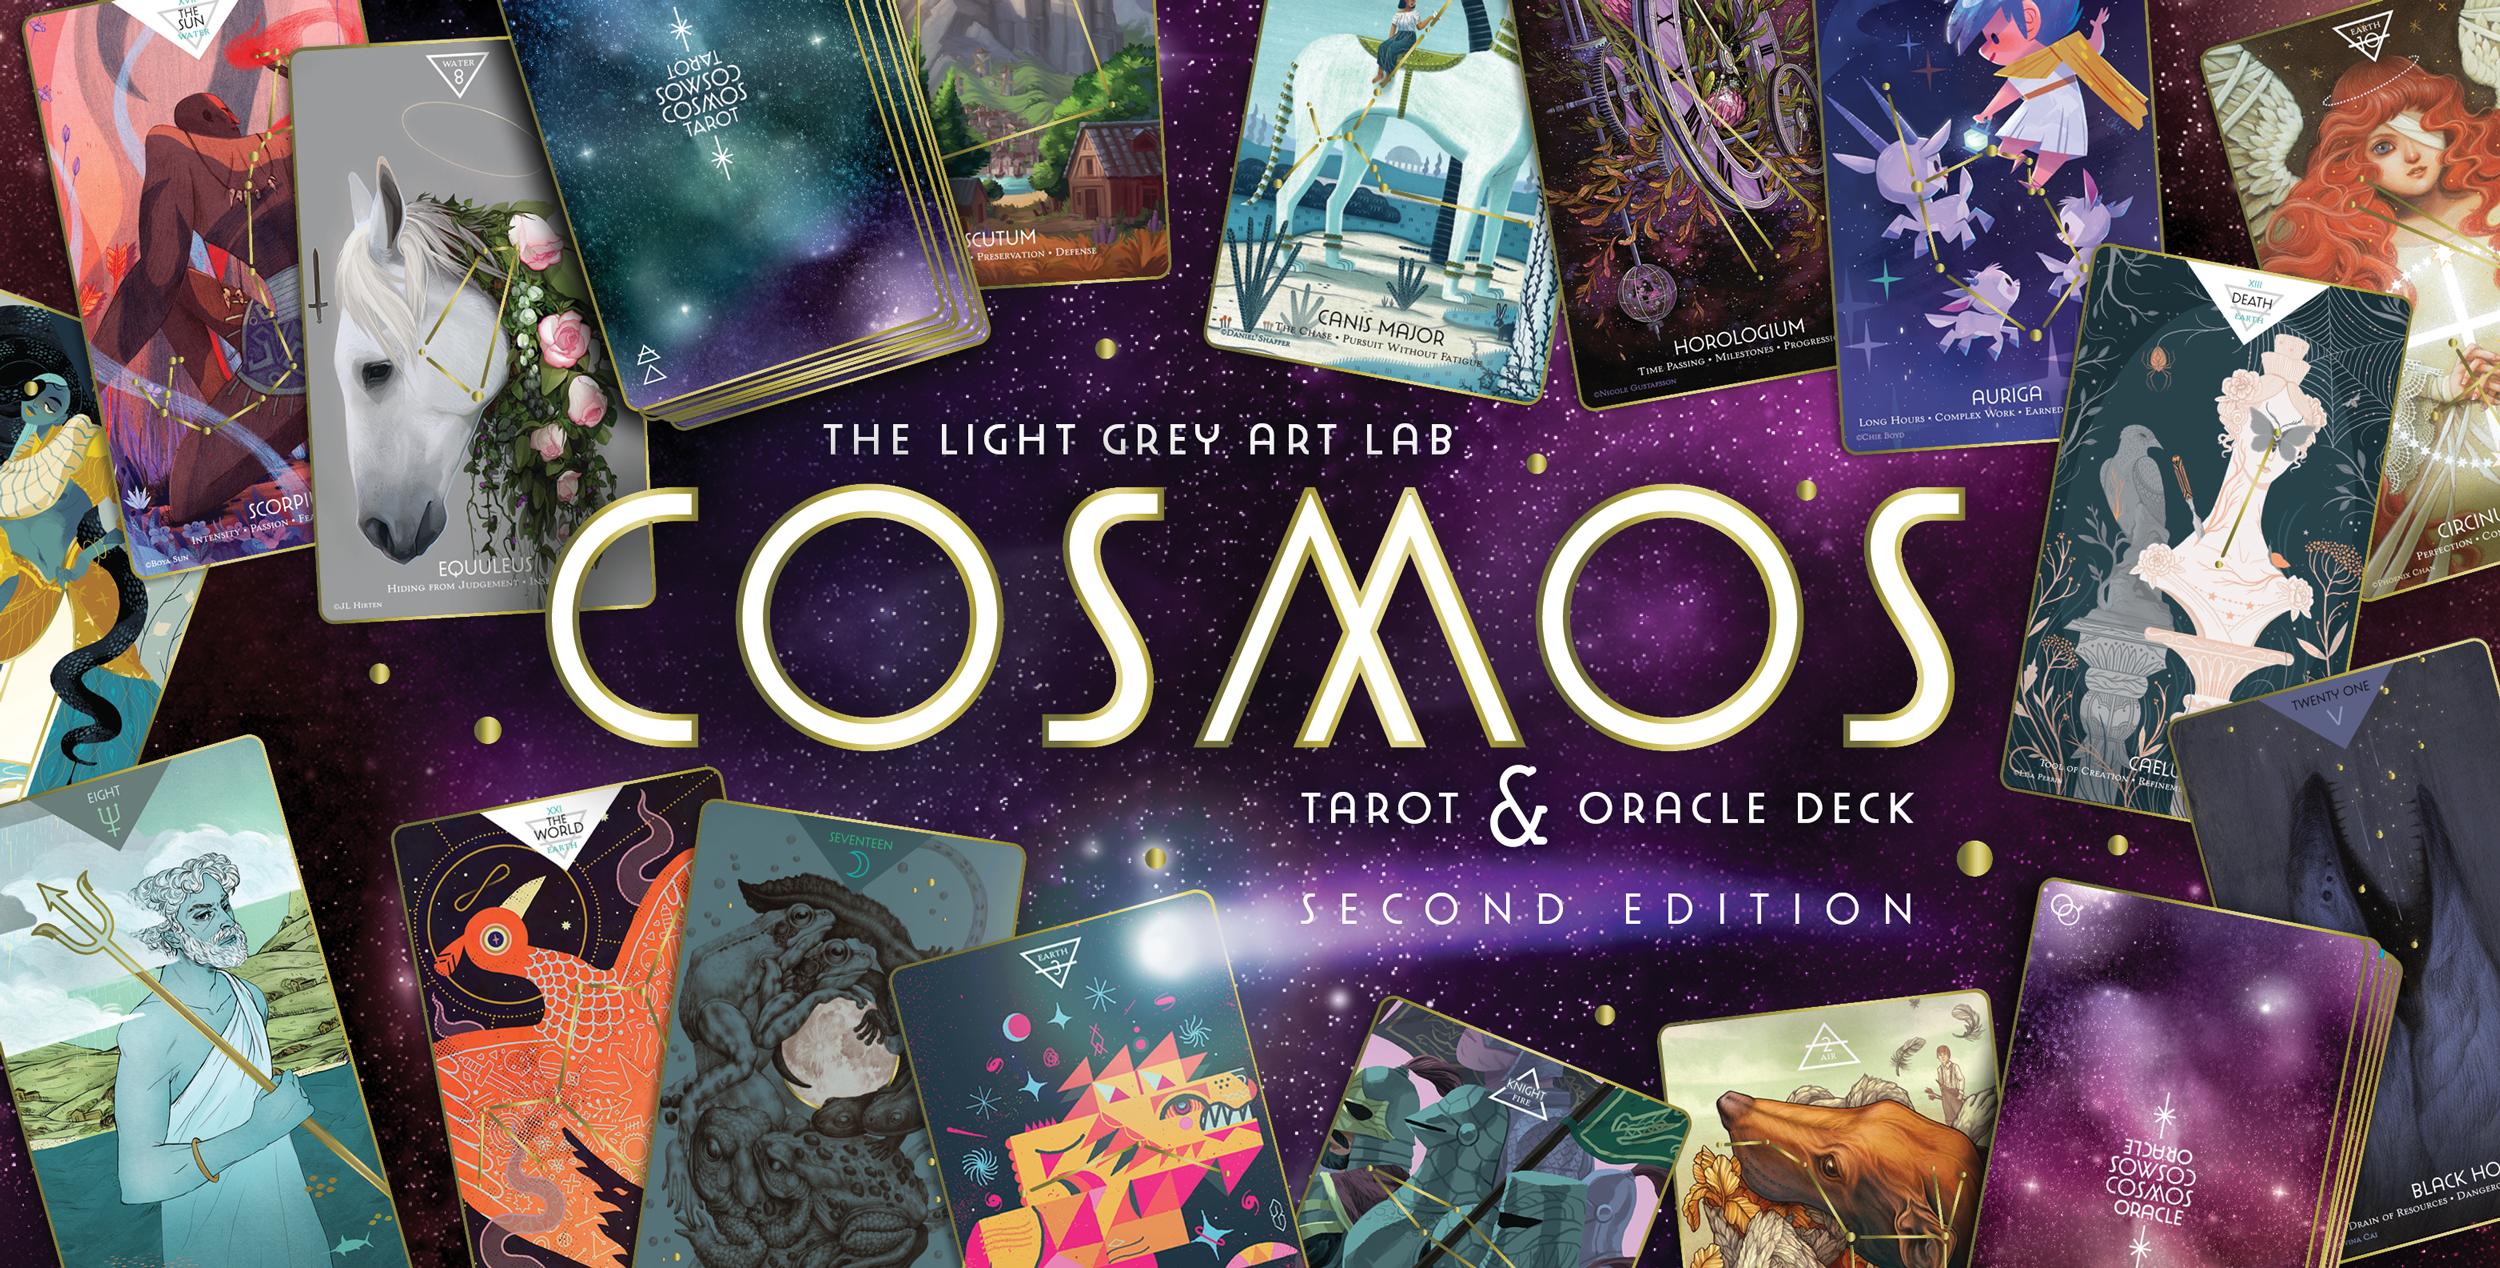 CosmosSecondEdition_BoxTop_PromoImage.jpg